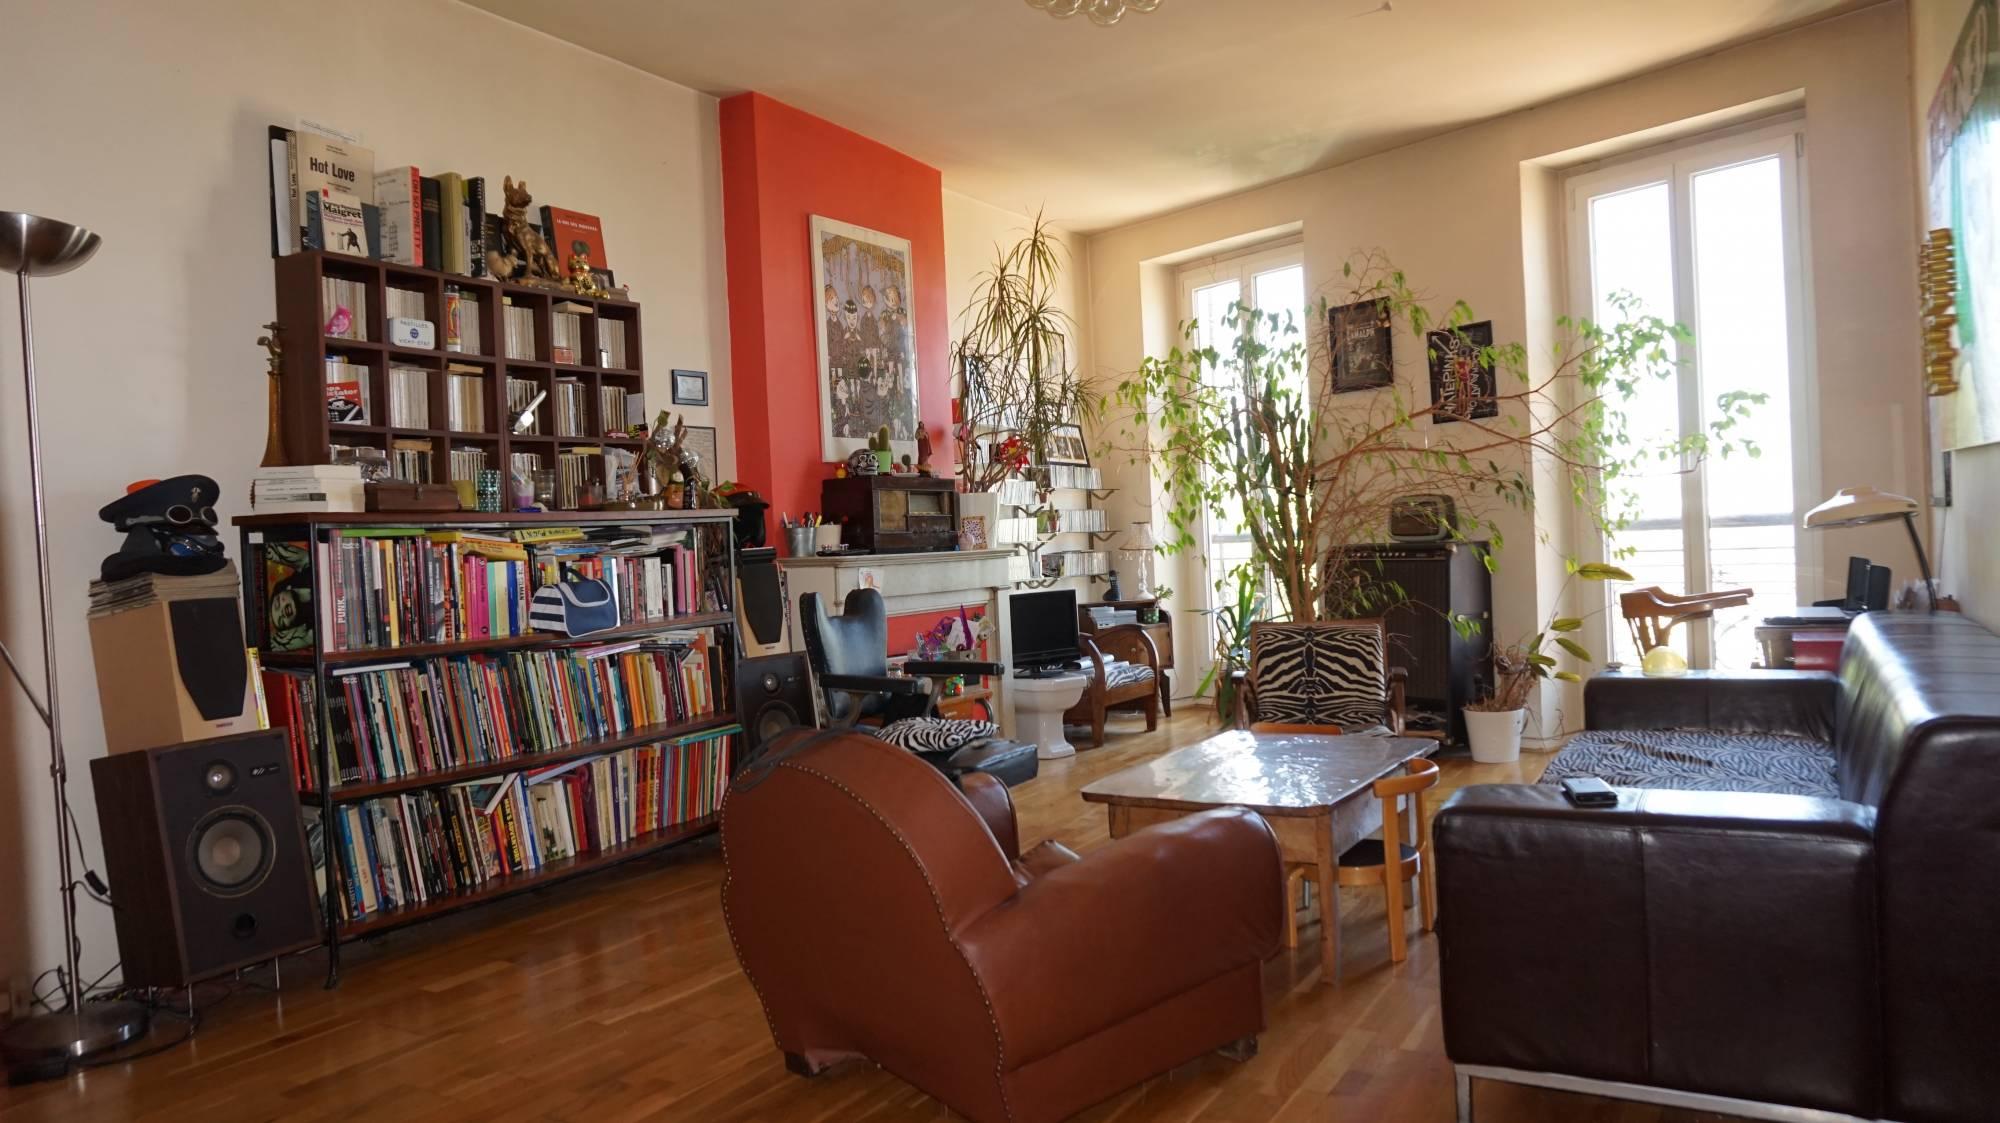 Vente appartement t2 avec garage marseille 13008 prado for Appartement vente